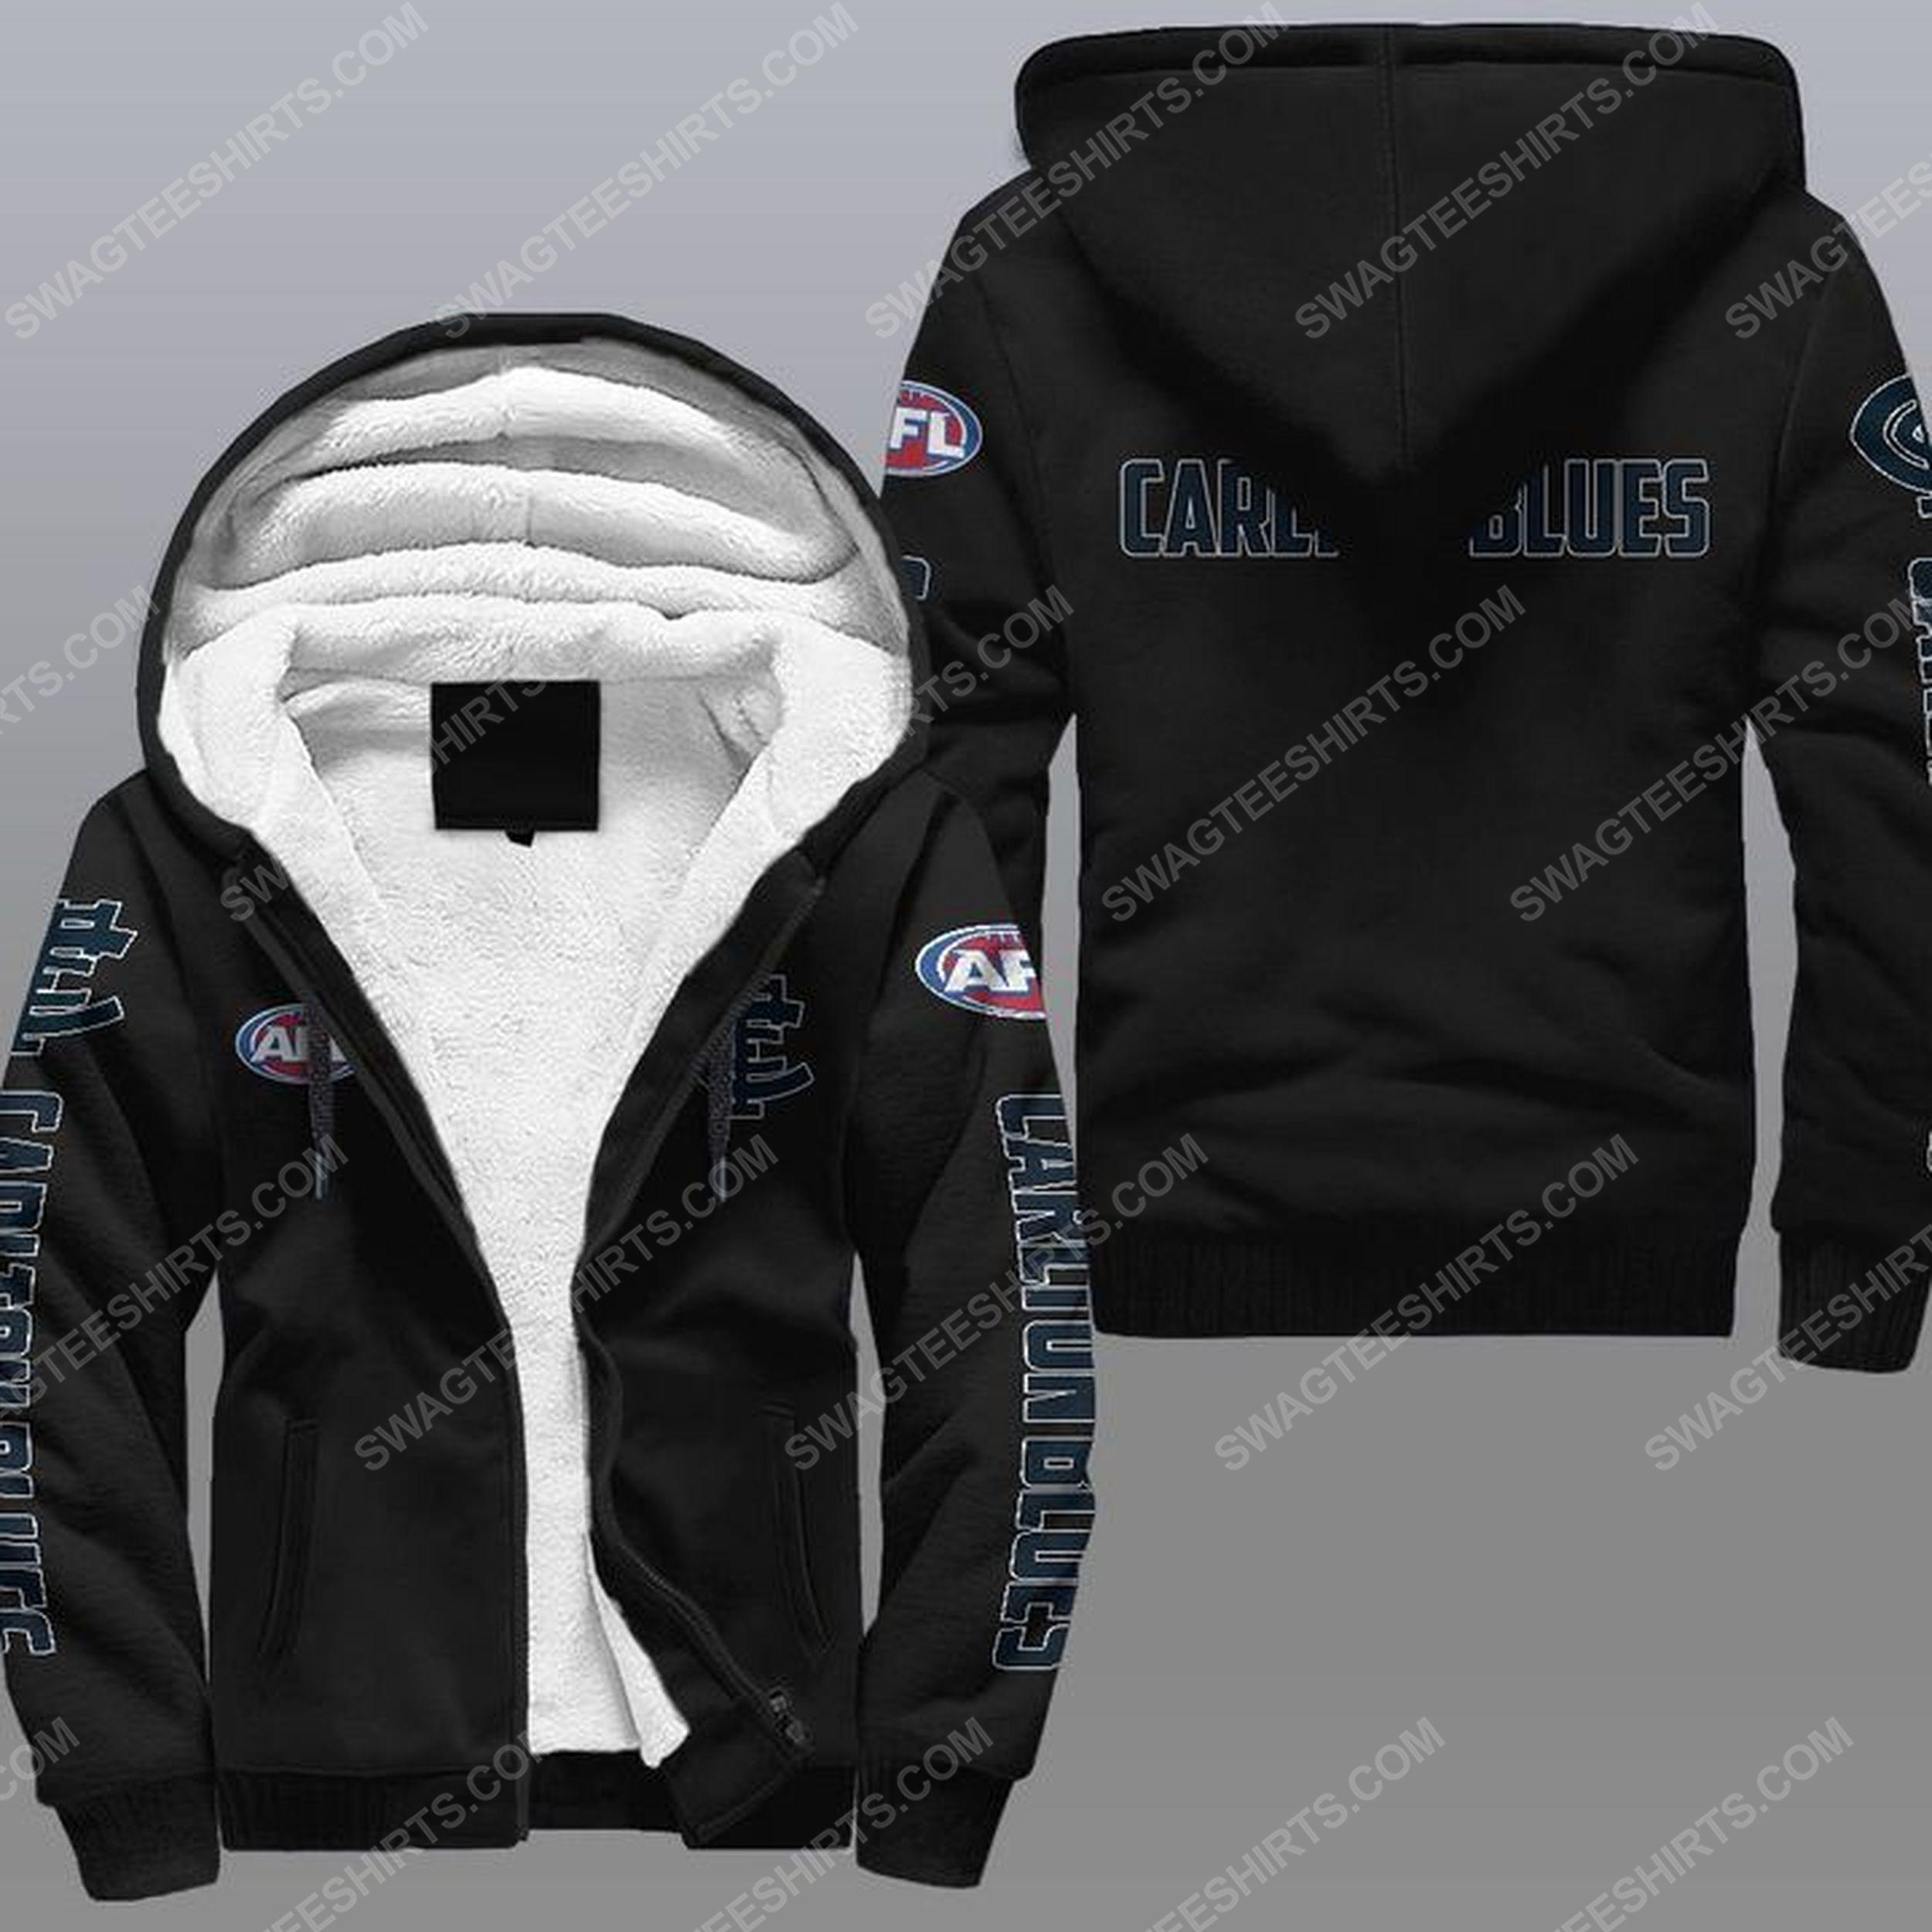 The carlton football club all over print fleece hoodie - black 1